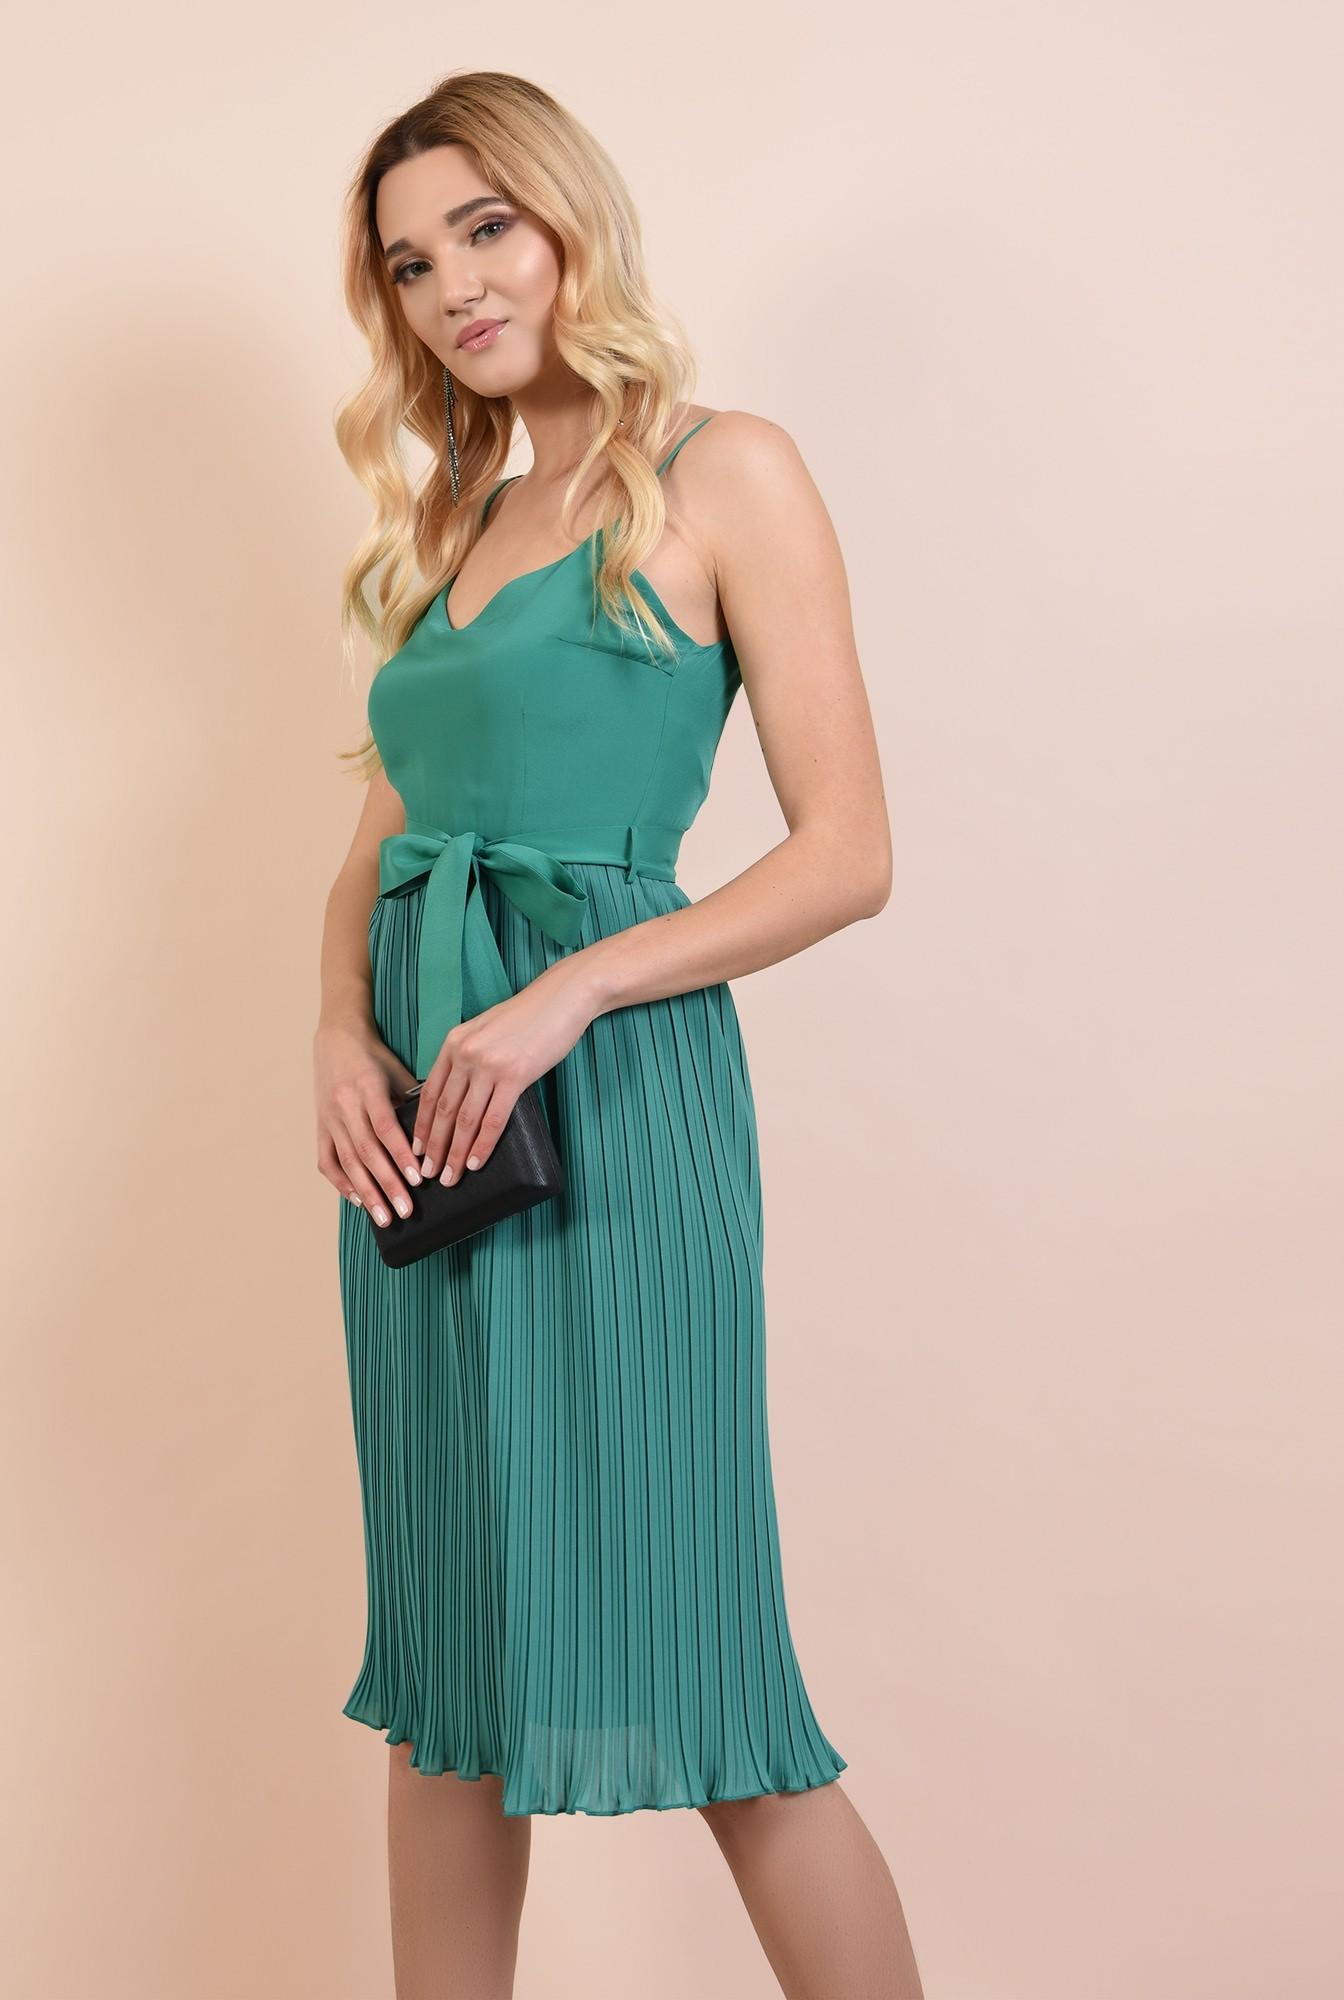 0 - rochie eleganta, midi, din voal plise, cu cordon, verde turcoaz